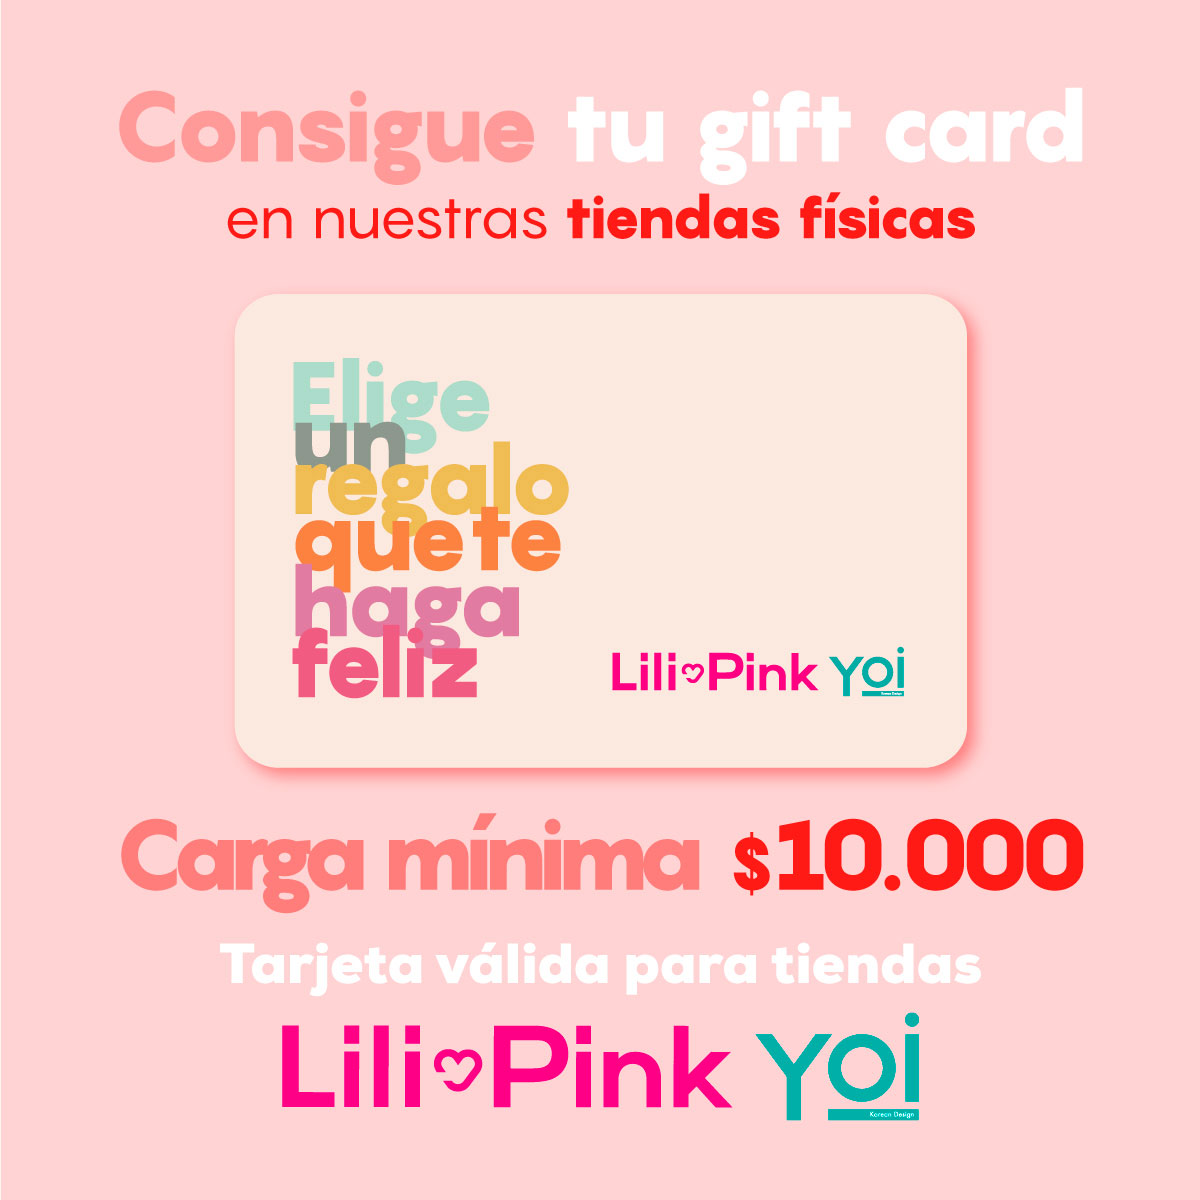 #GiftcardLilipinkYoi